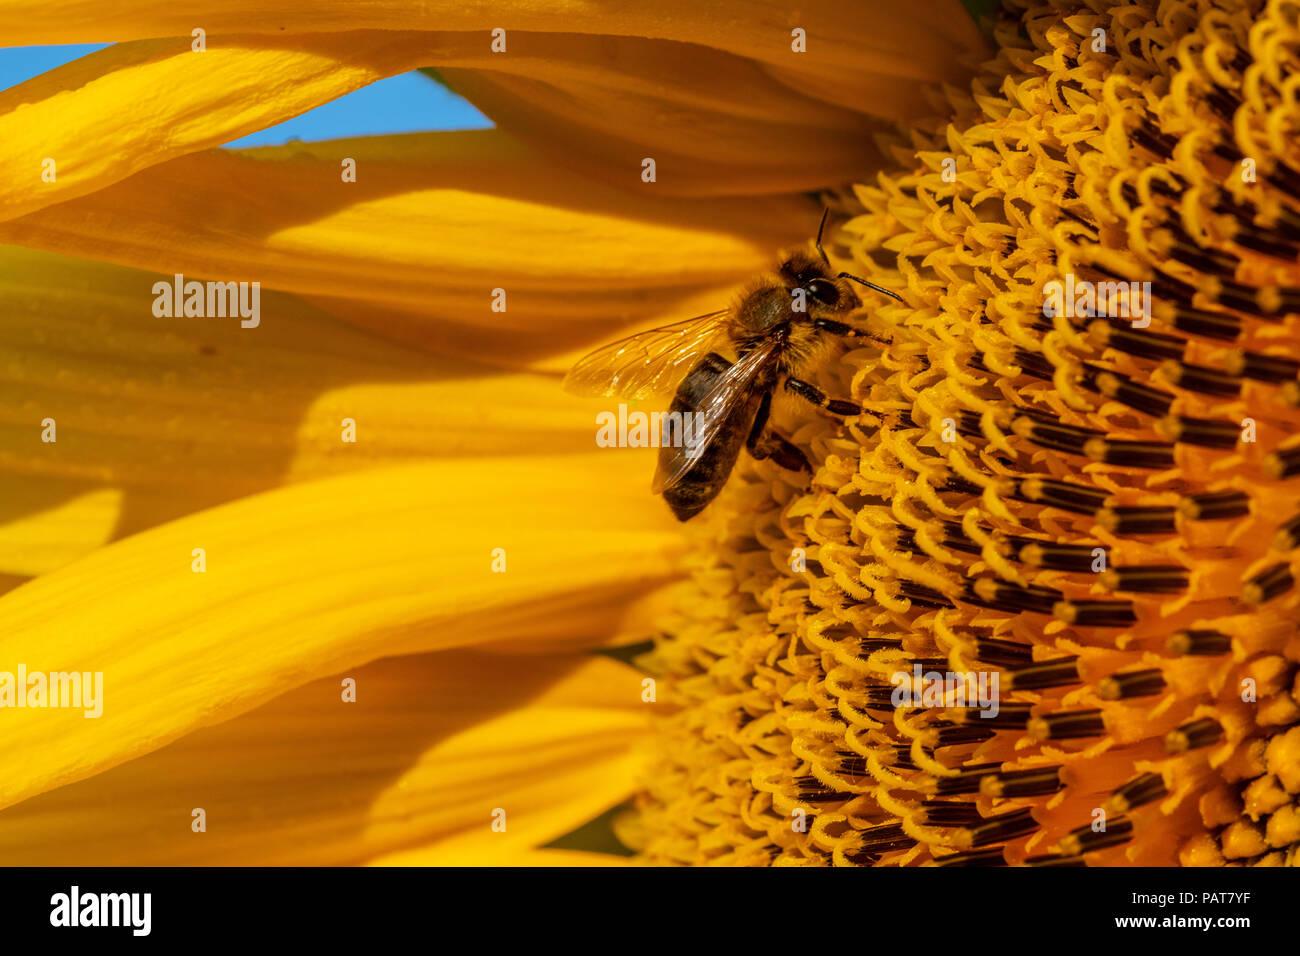 Honig Biene auf Sonnenblumen, Nahaufnahme Stockbild